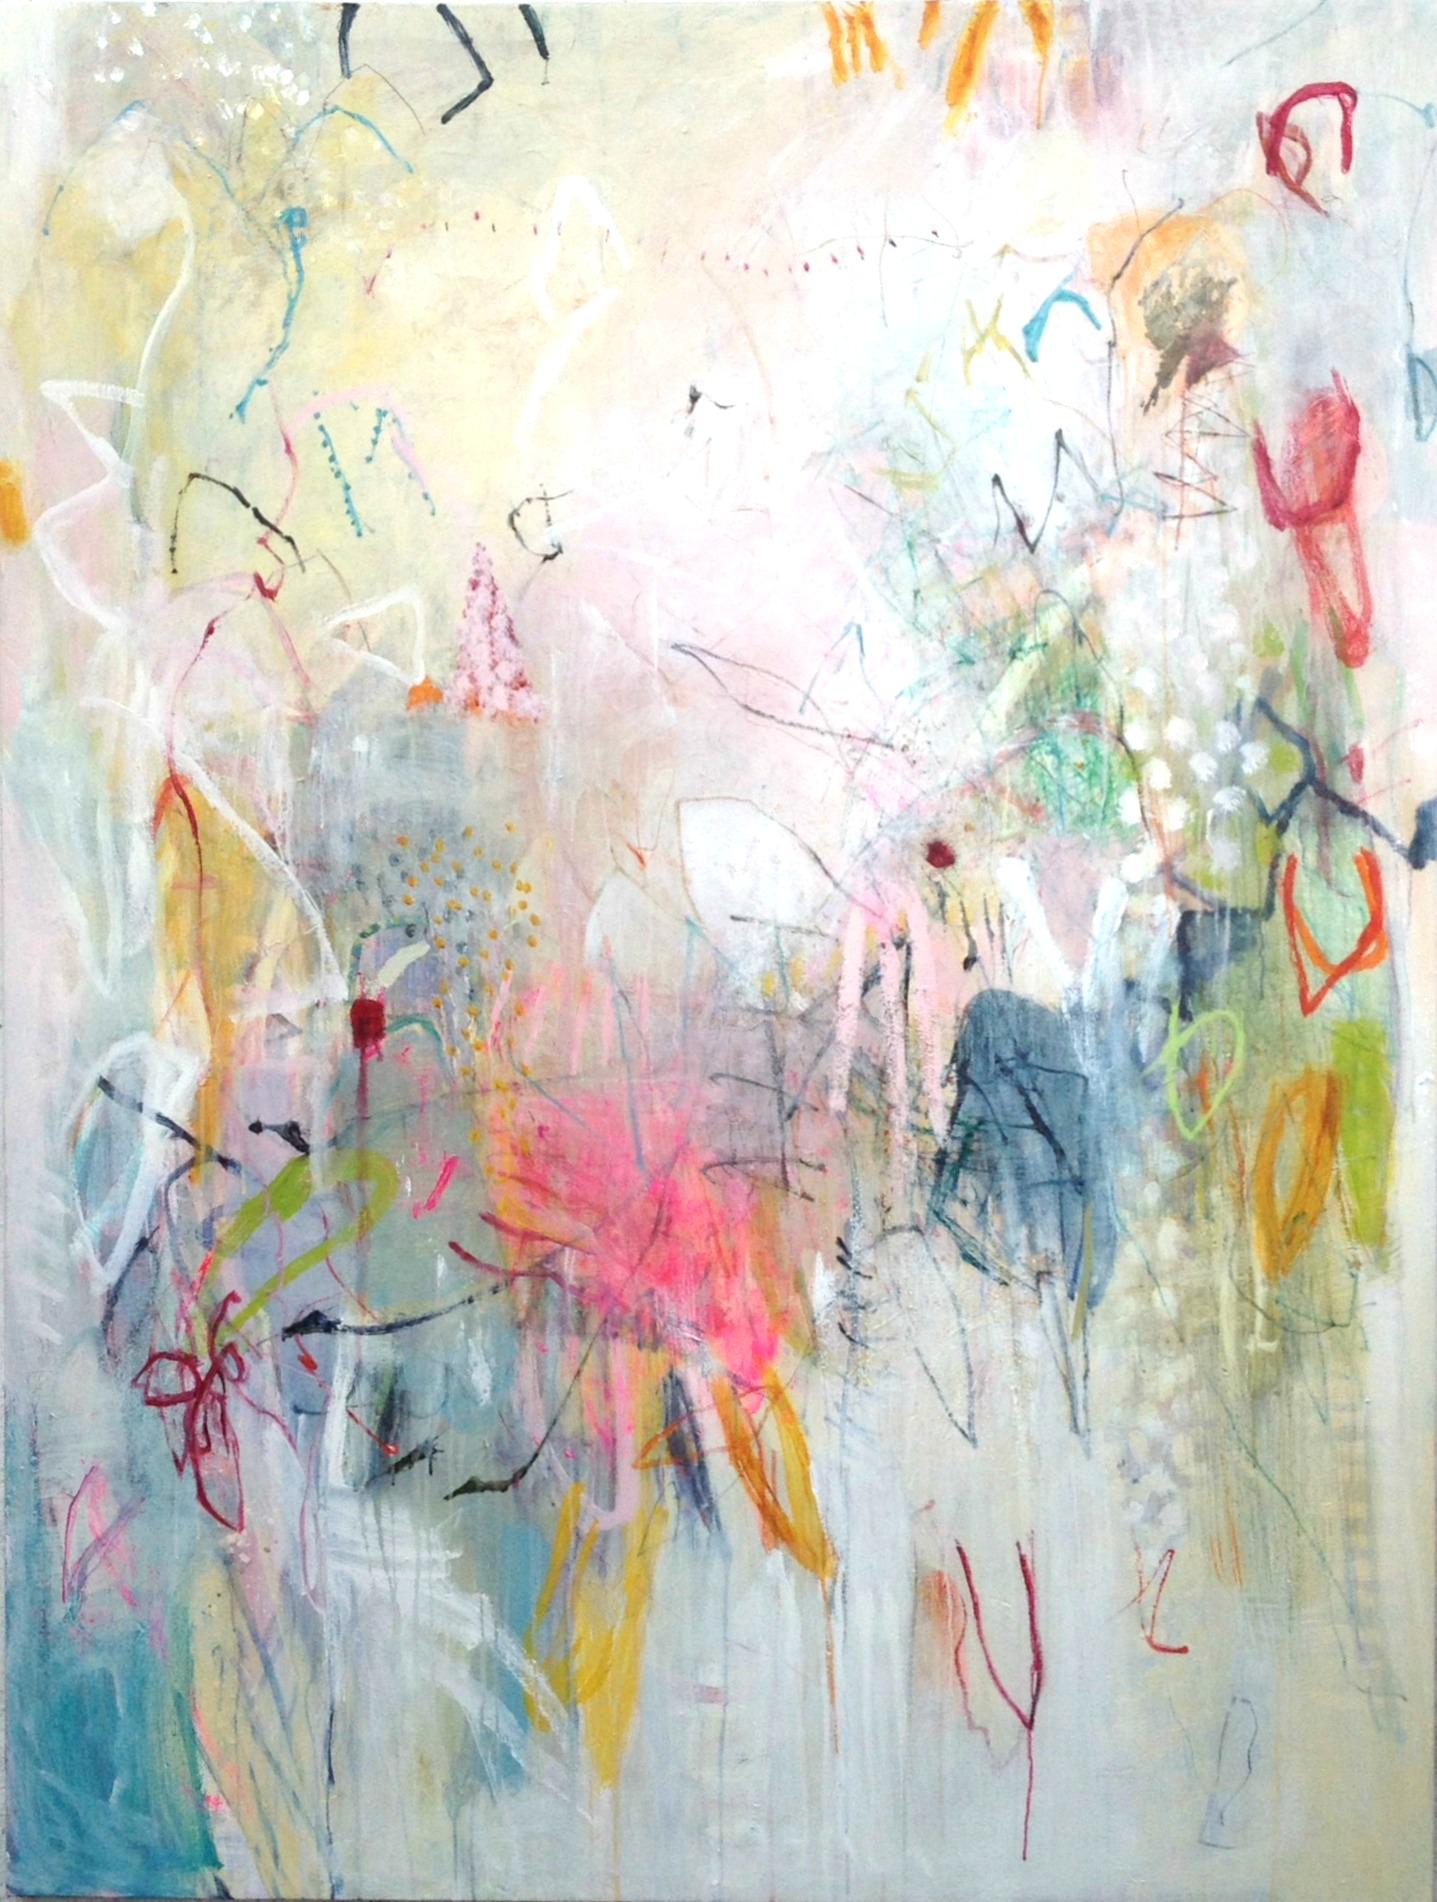 Michelle Breton,  Gossamer,  Acrylic on Canvas, 183 x 153cm, $12,000